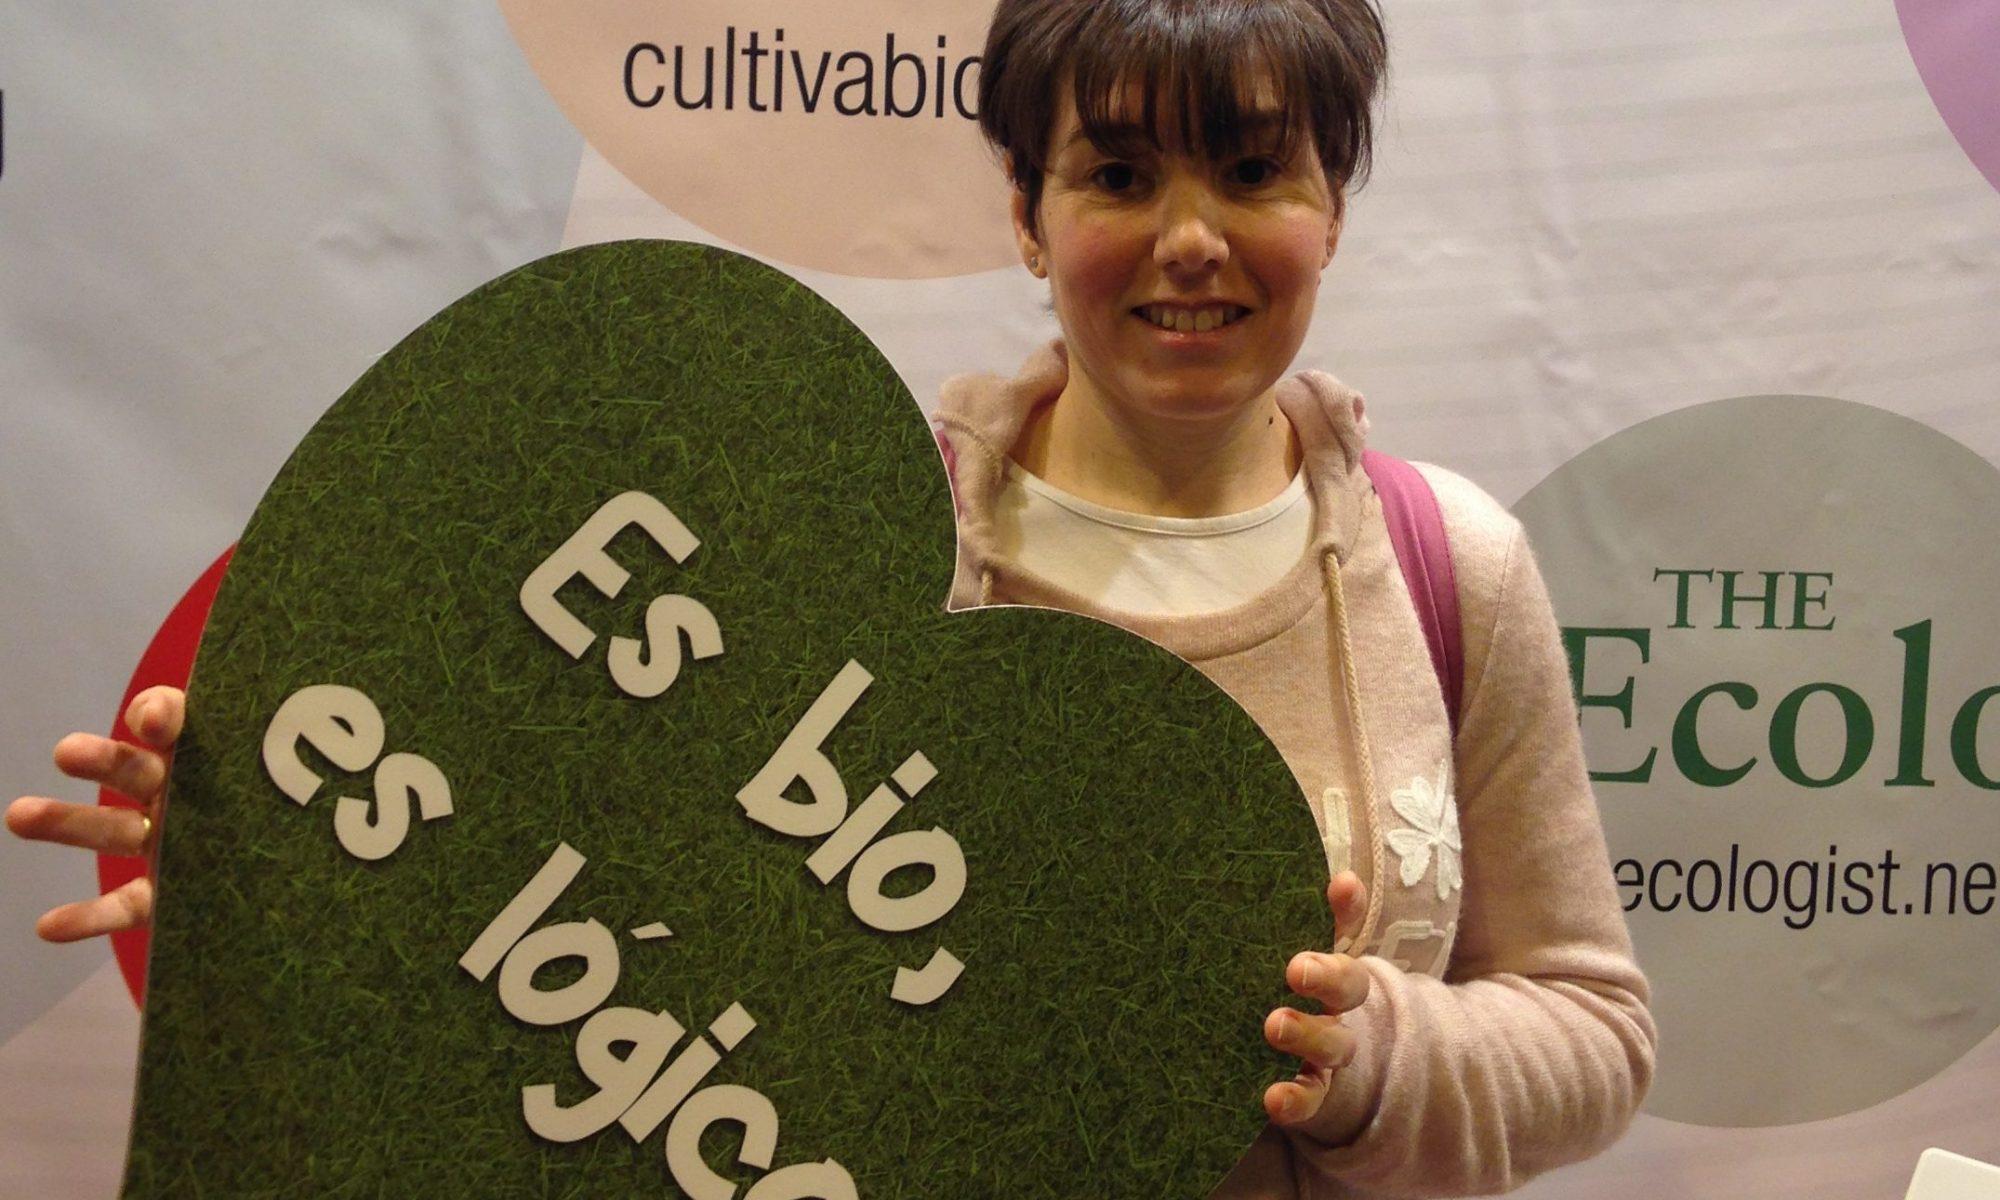 biocultura, alimentacion, anayany.com, salud